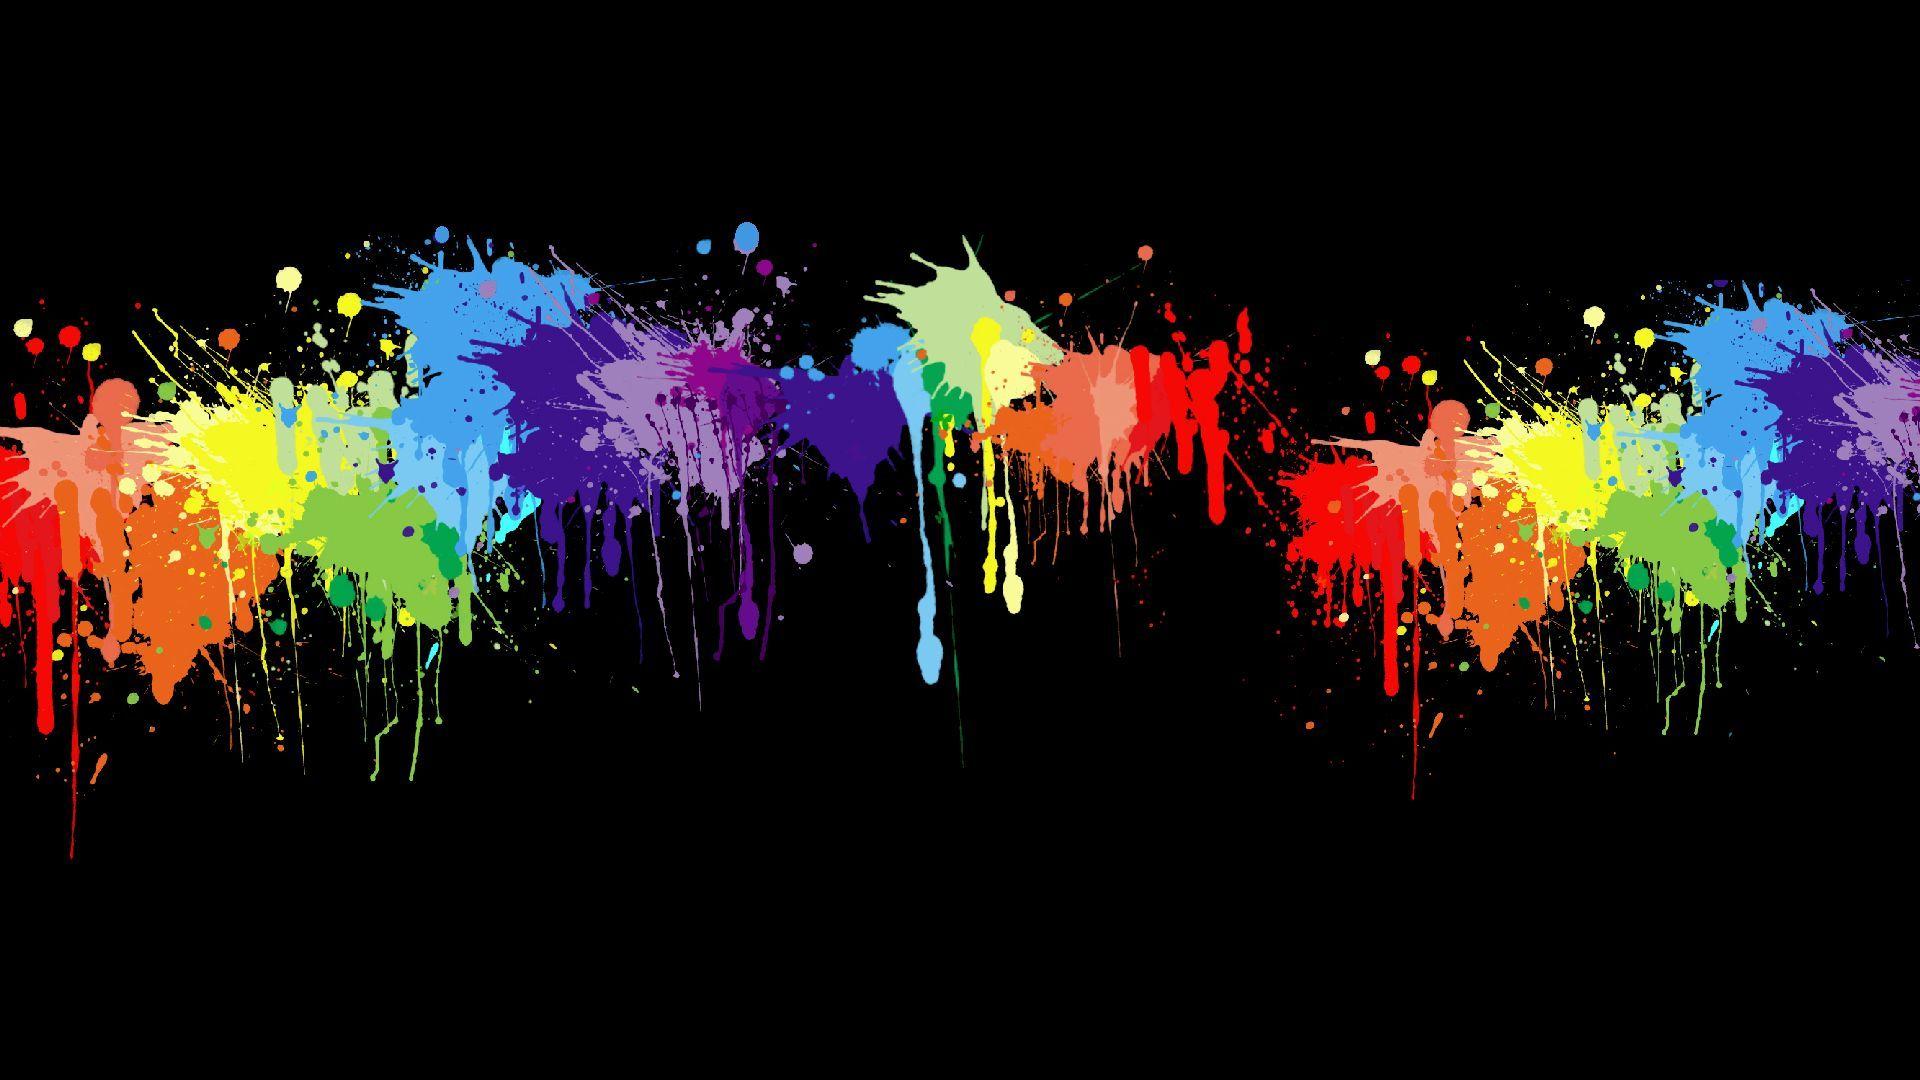 Neon Splatter Wallpaper